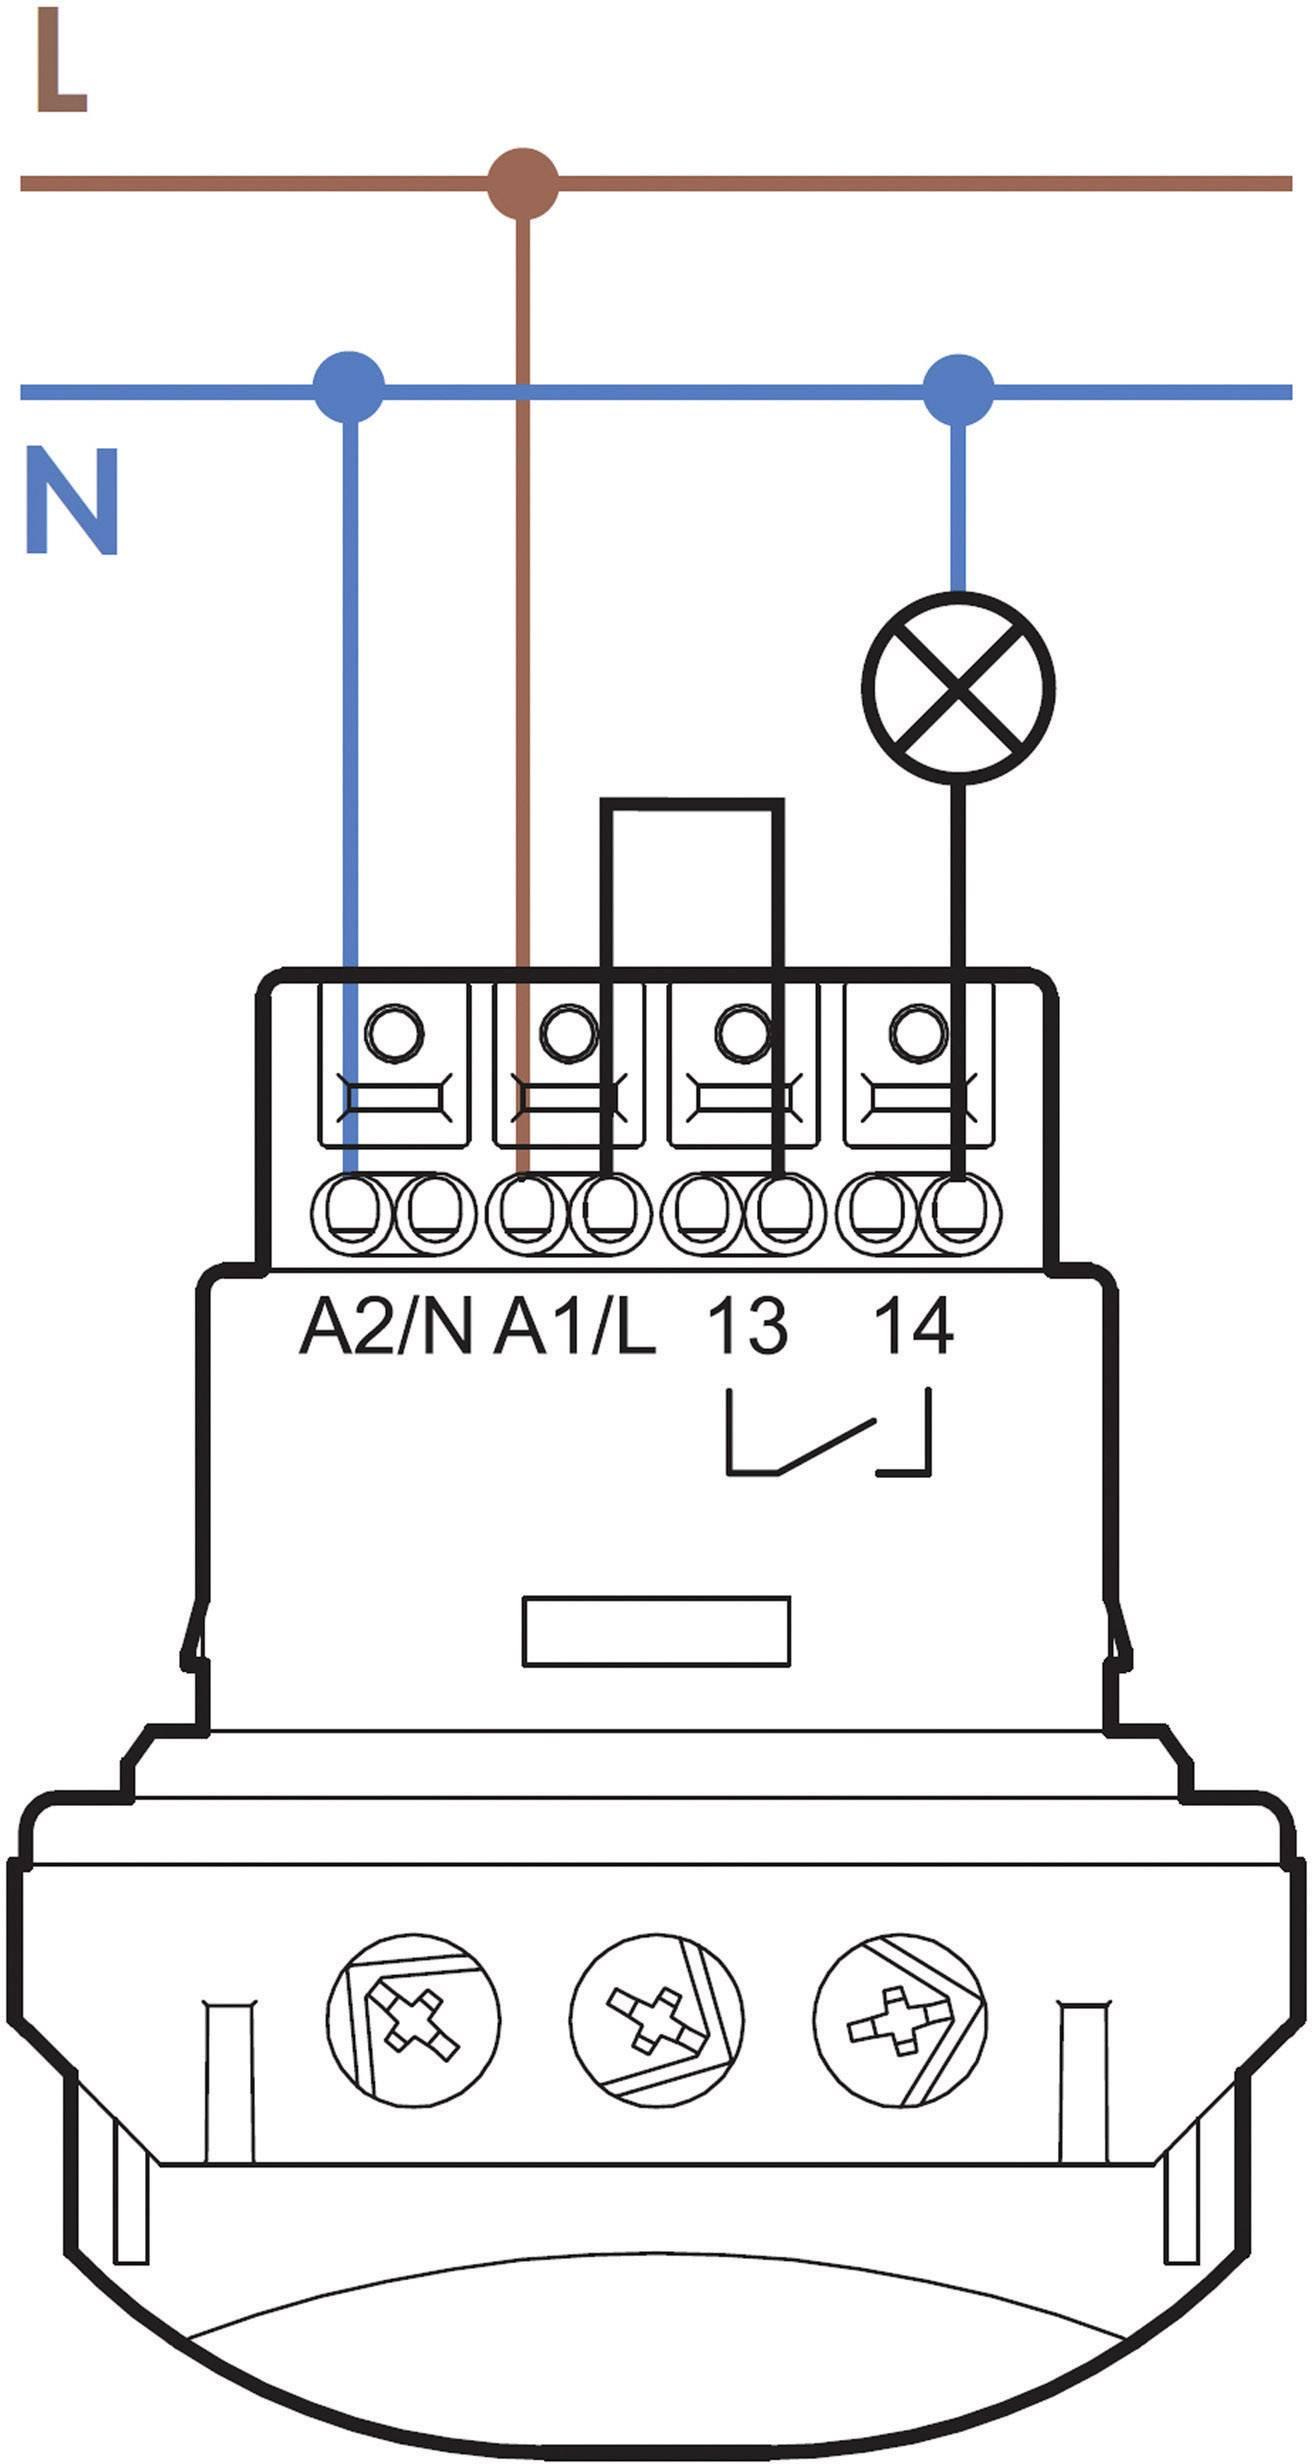 Senzor pohybu Finder 18.51.8.230.0300, 250 V/AC, Max. dosah 8 m